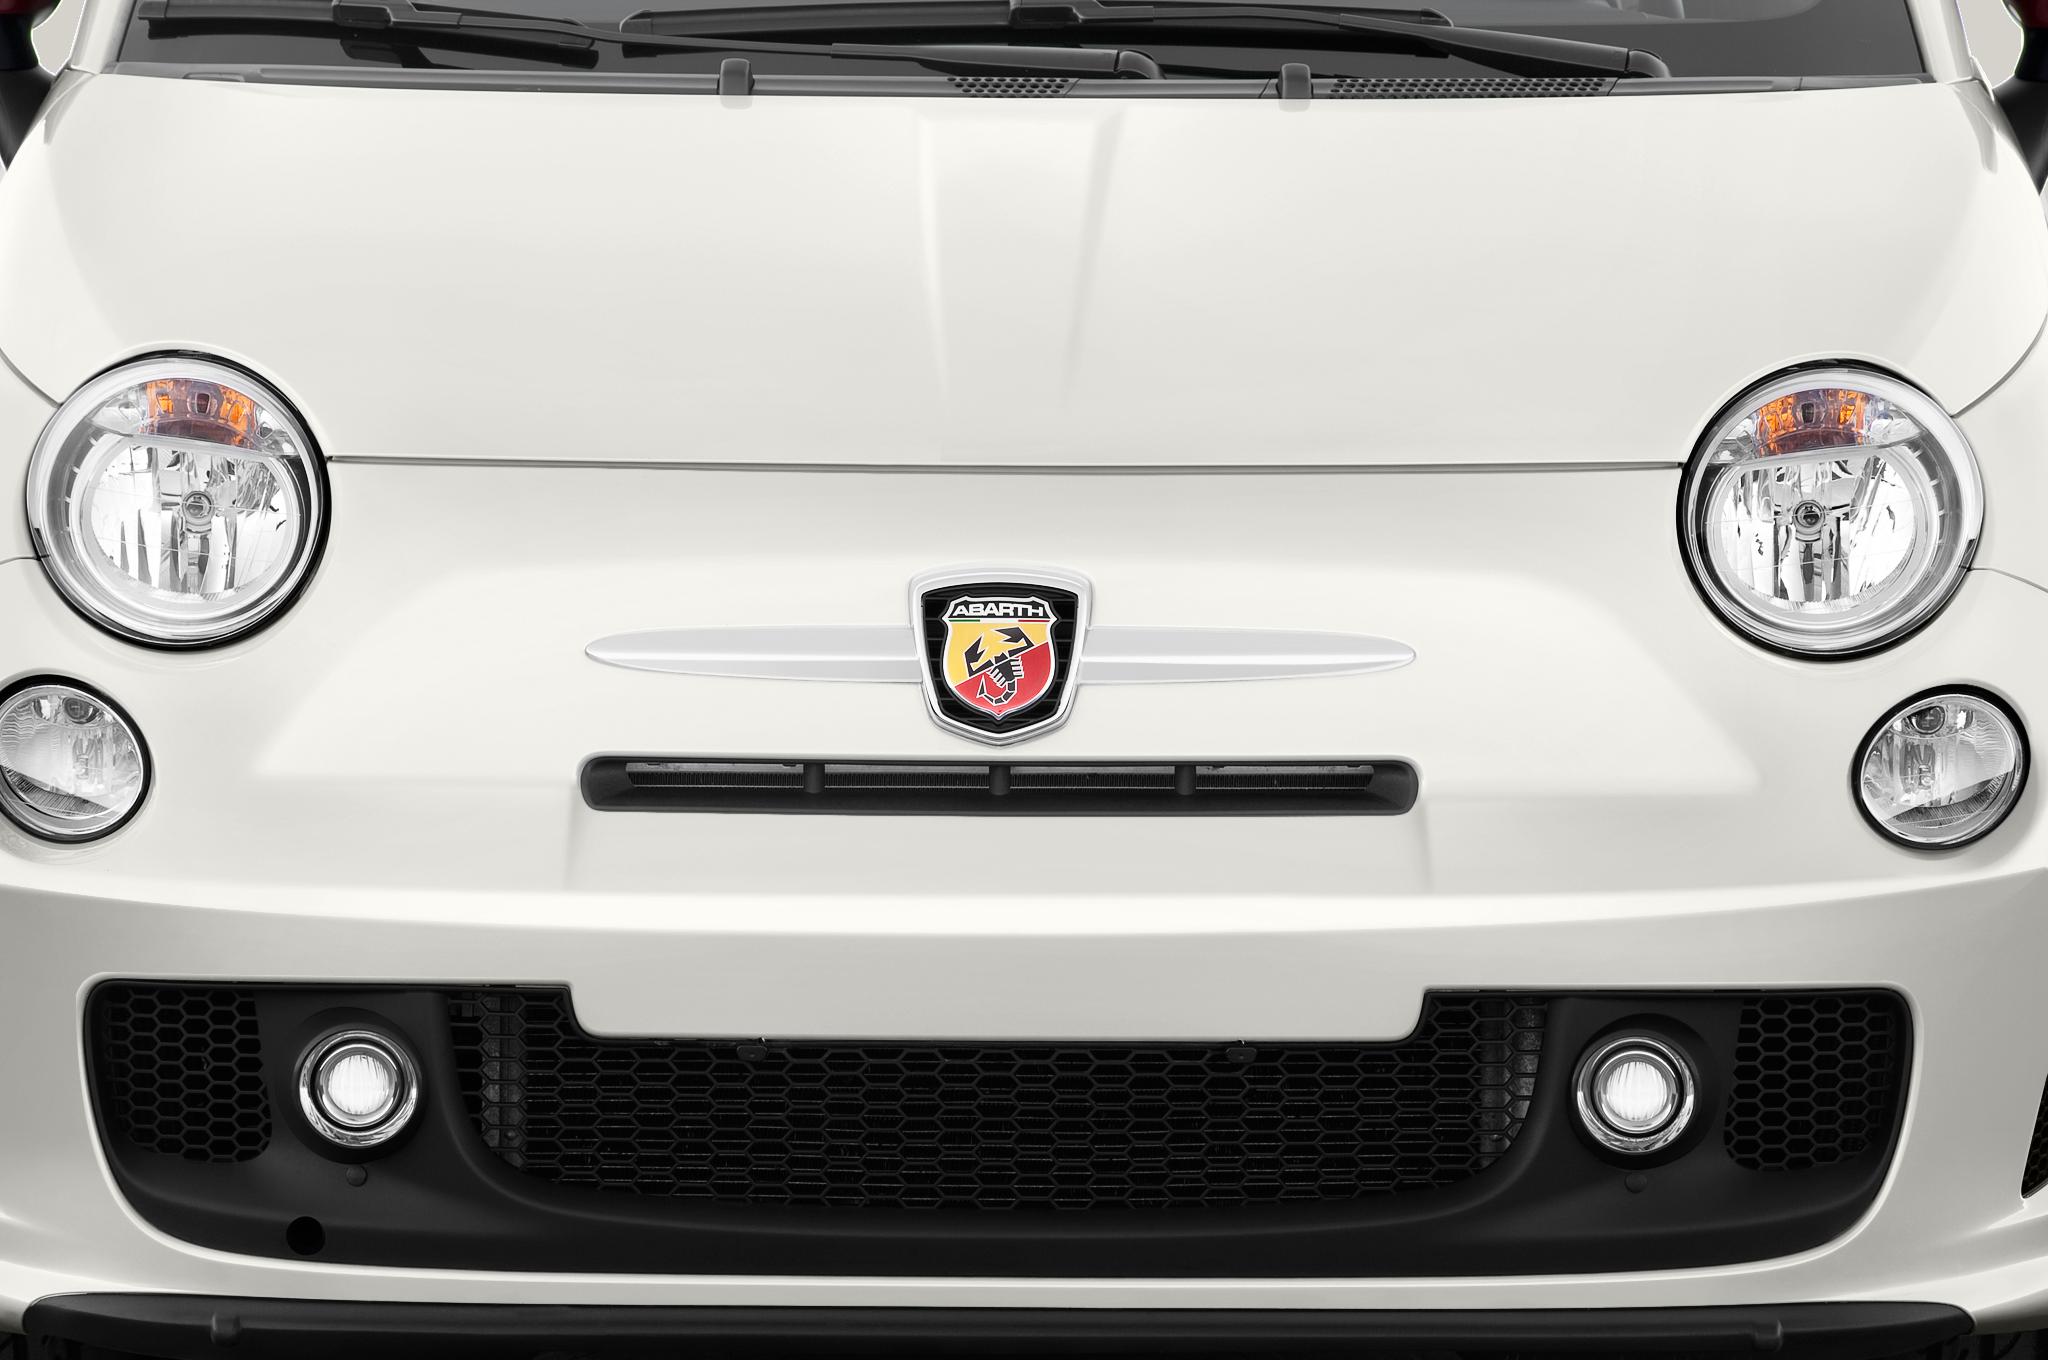 2015 Fiat 500 Abarth Automatic Around The Block Interior 59 140